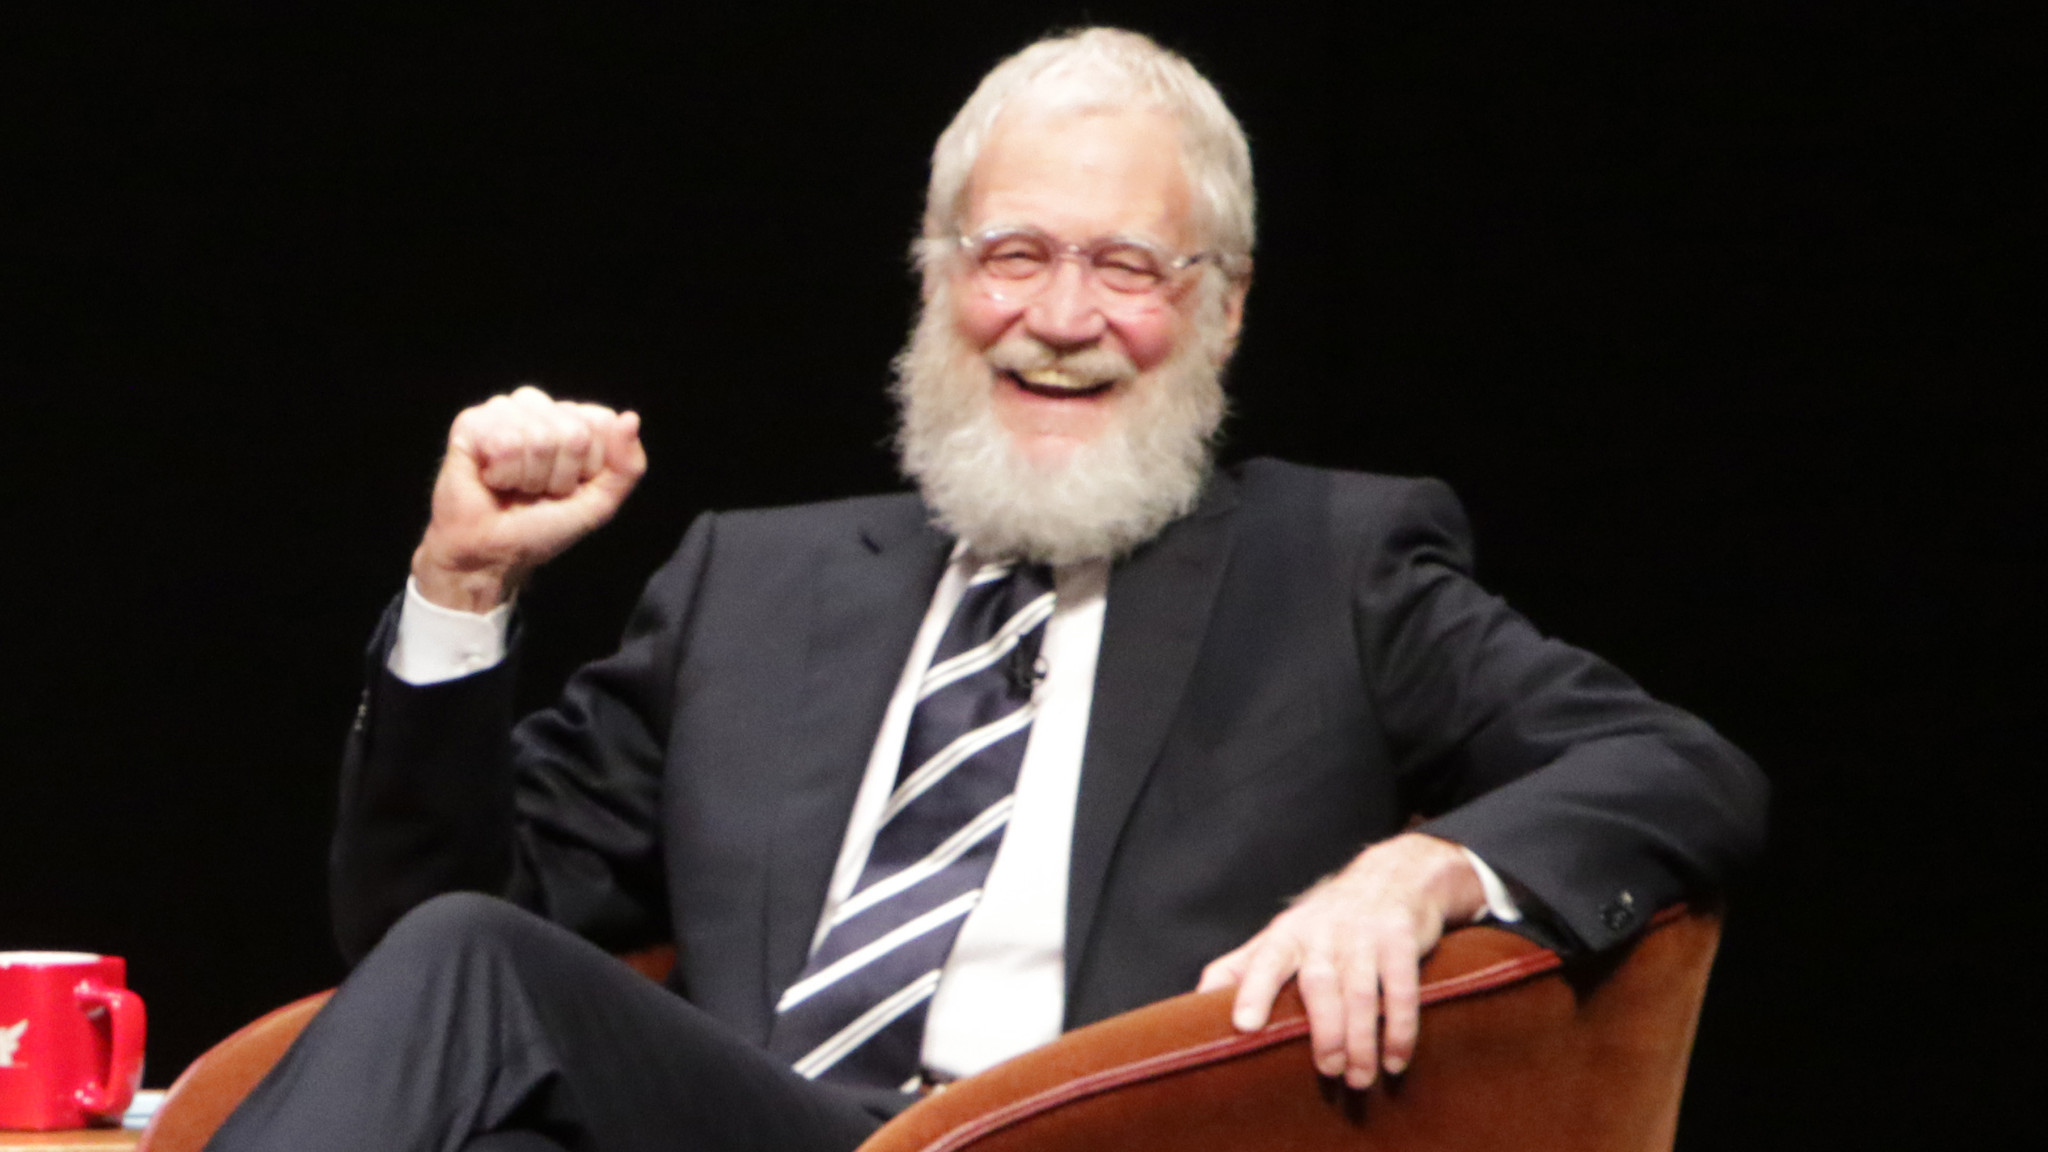 ct-retirement-beards-on-celebrities-20160329.jpg